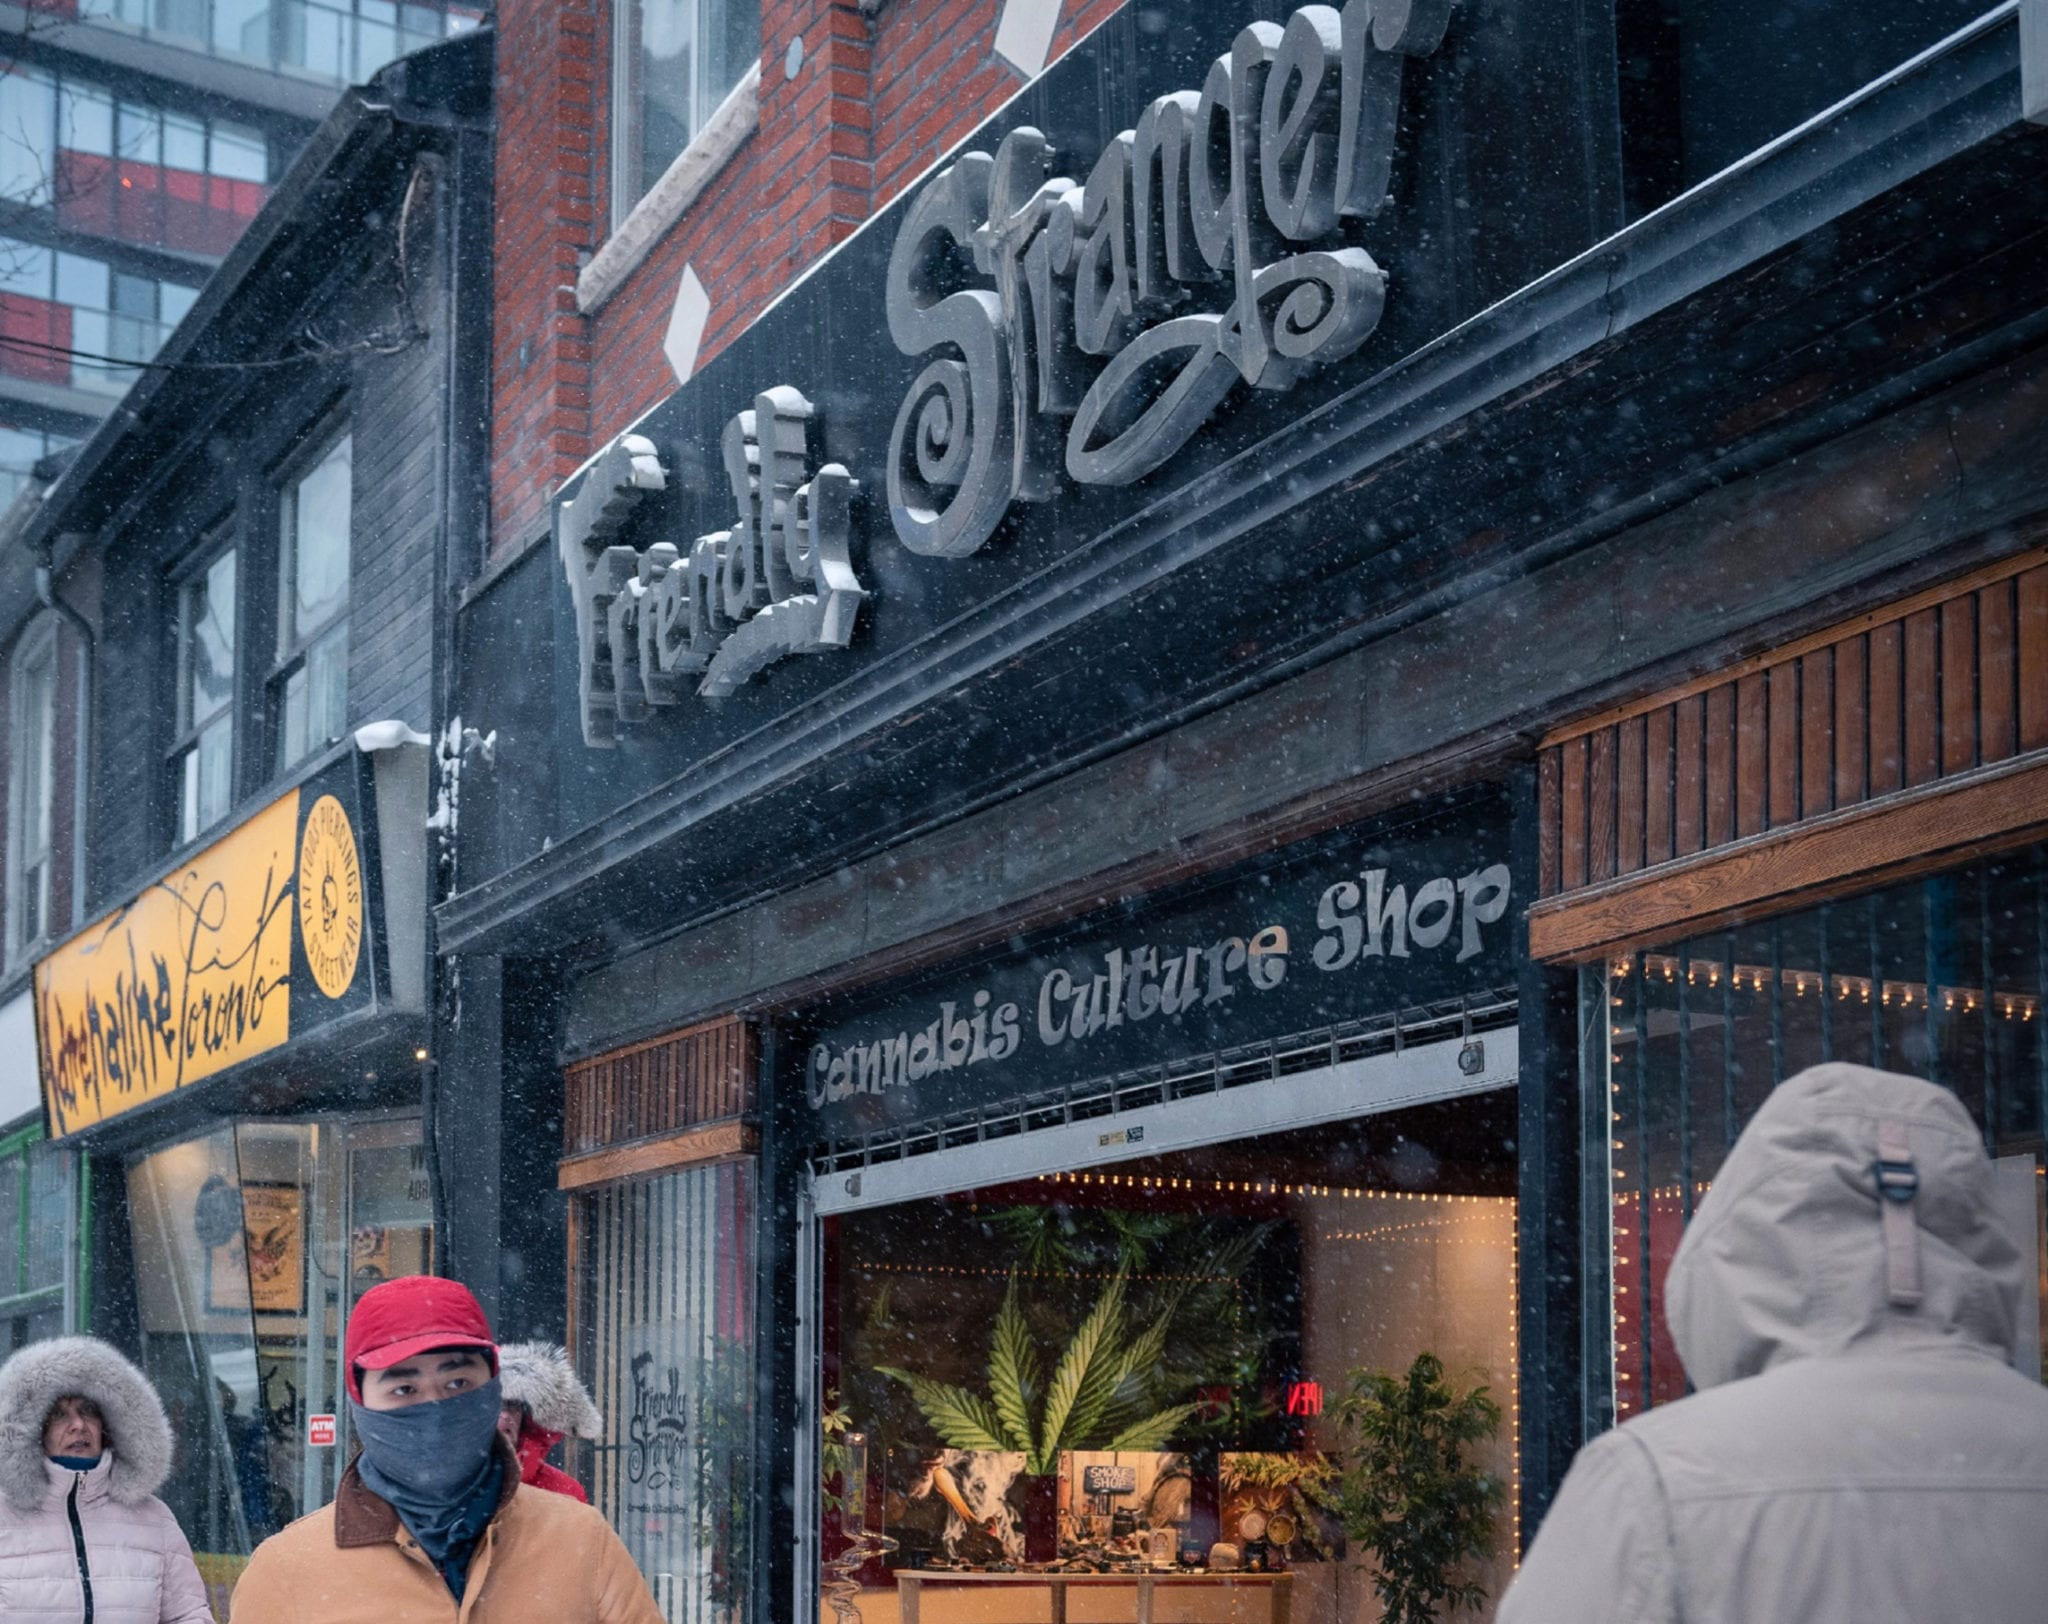 Fire & Flower to buy long-standing activist retailer Friendly Stranger